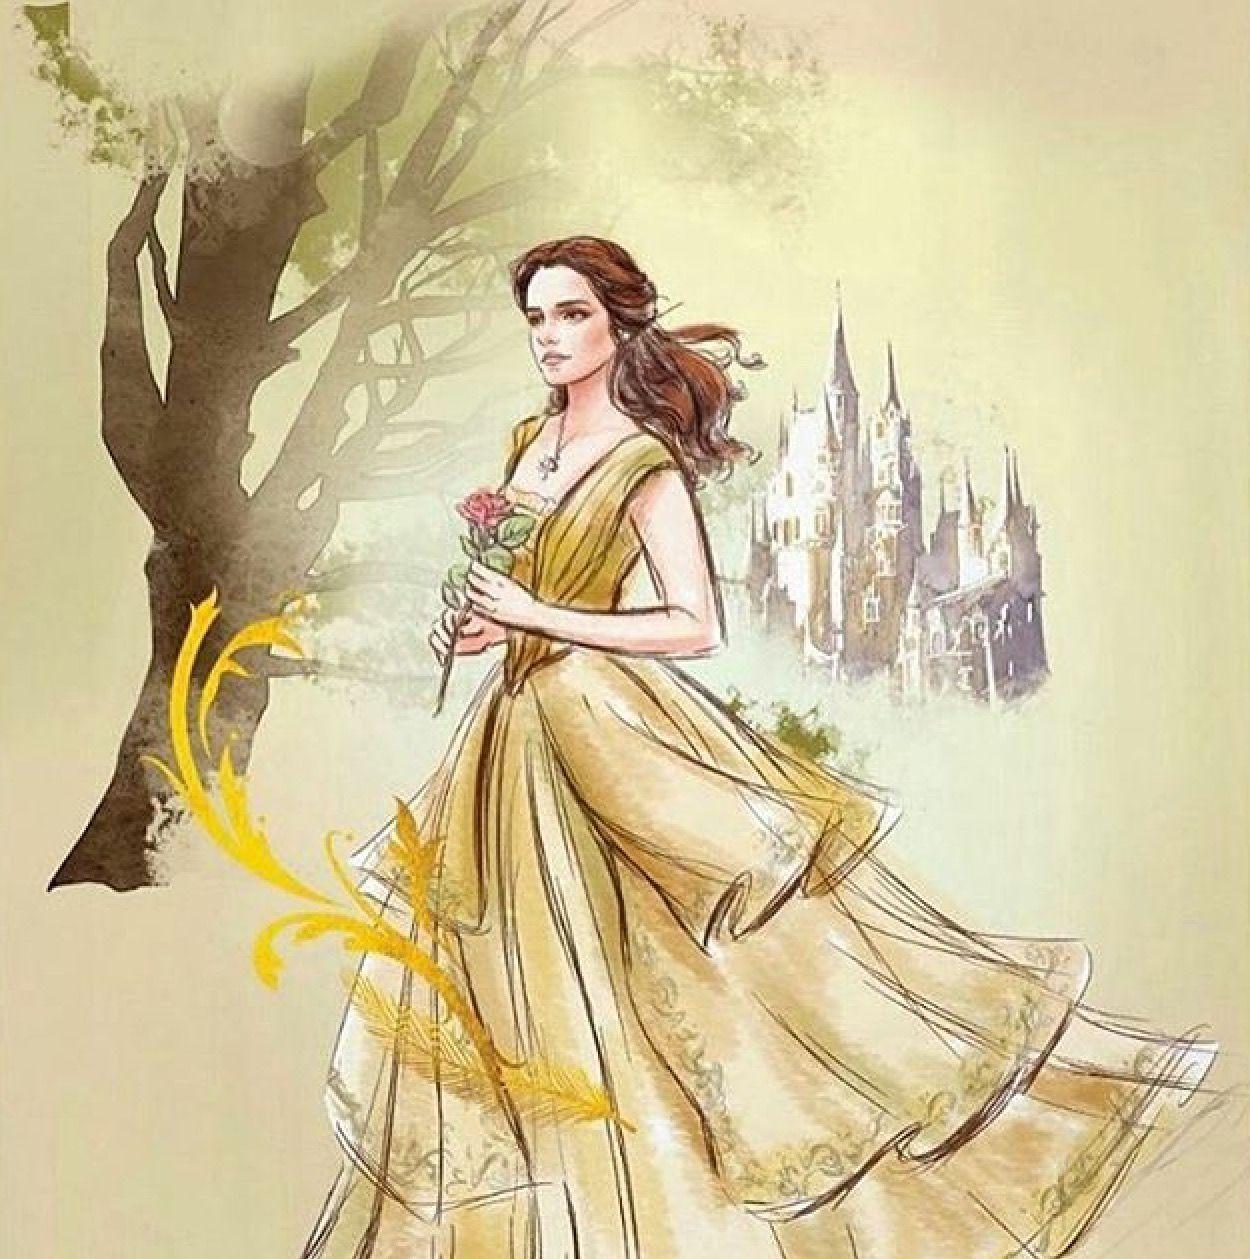 Yellow dress like belle  Pin by Tamilyn Watkins on Pics  Pinterest  Beast Disney art and